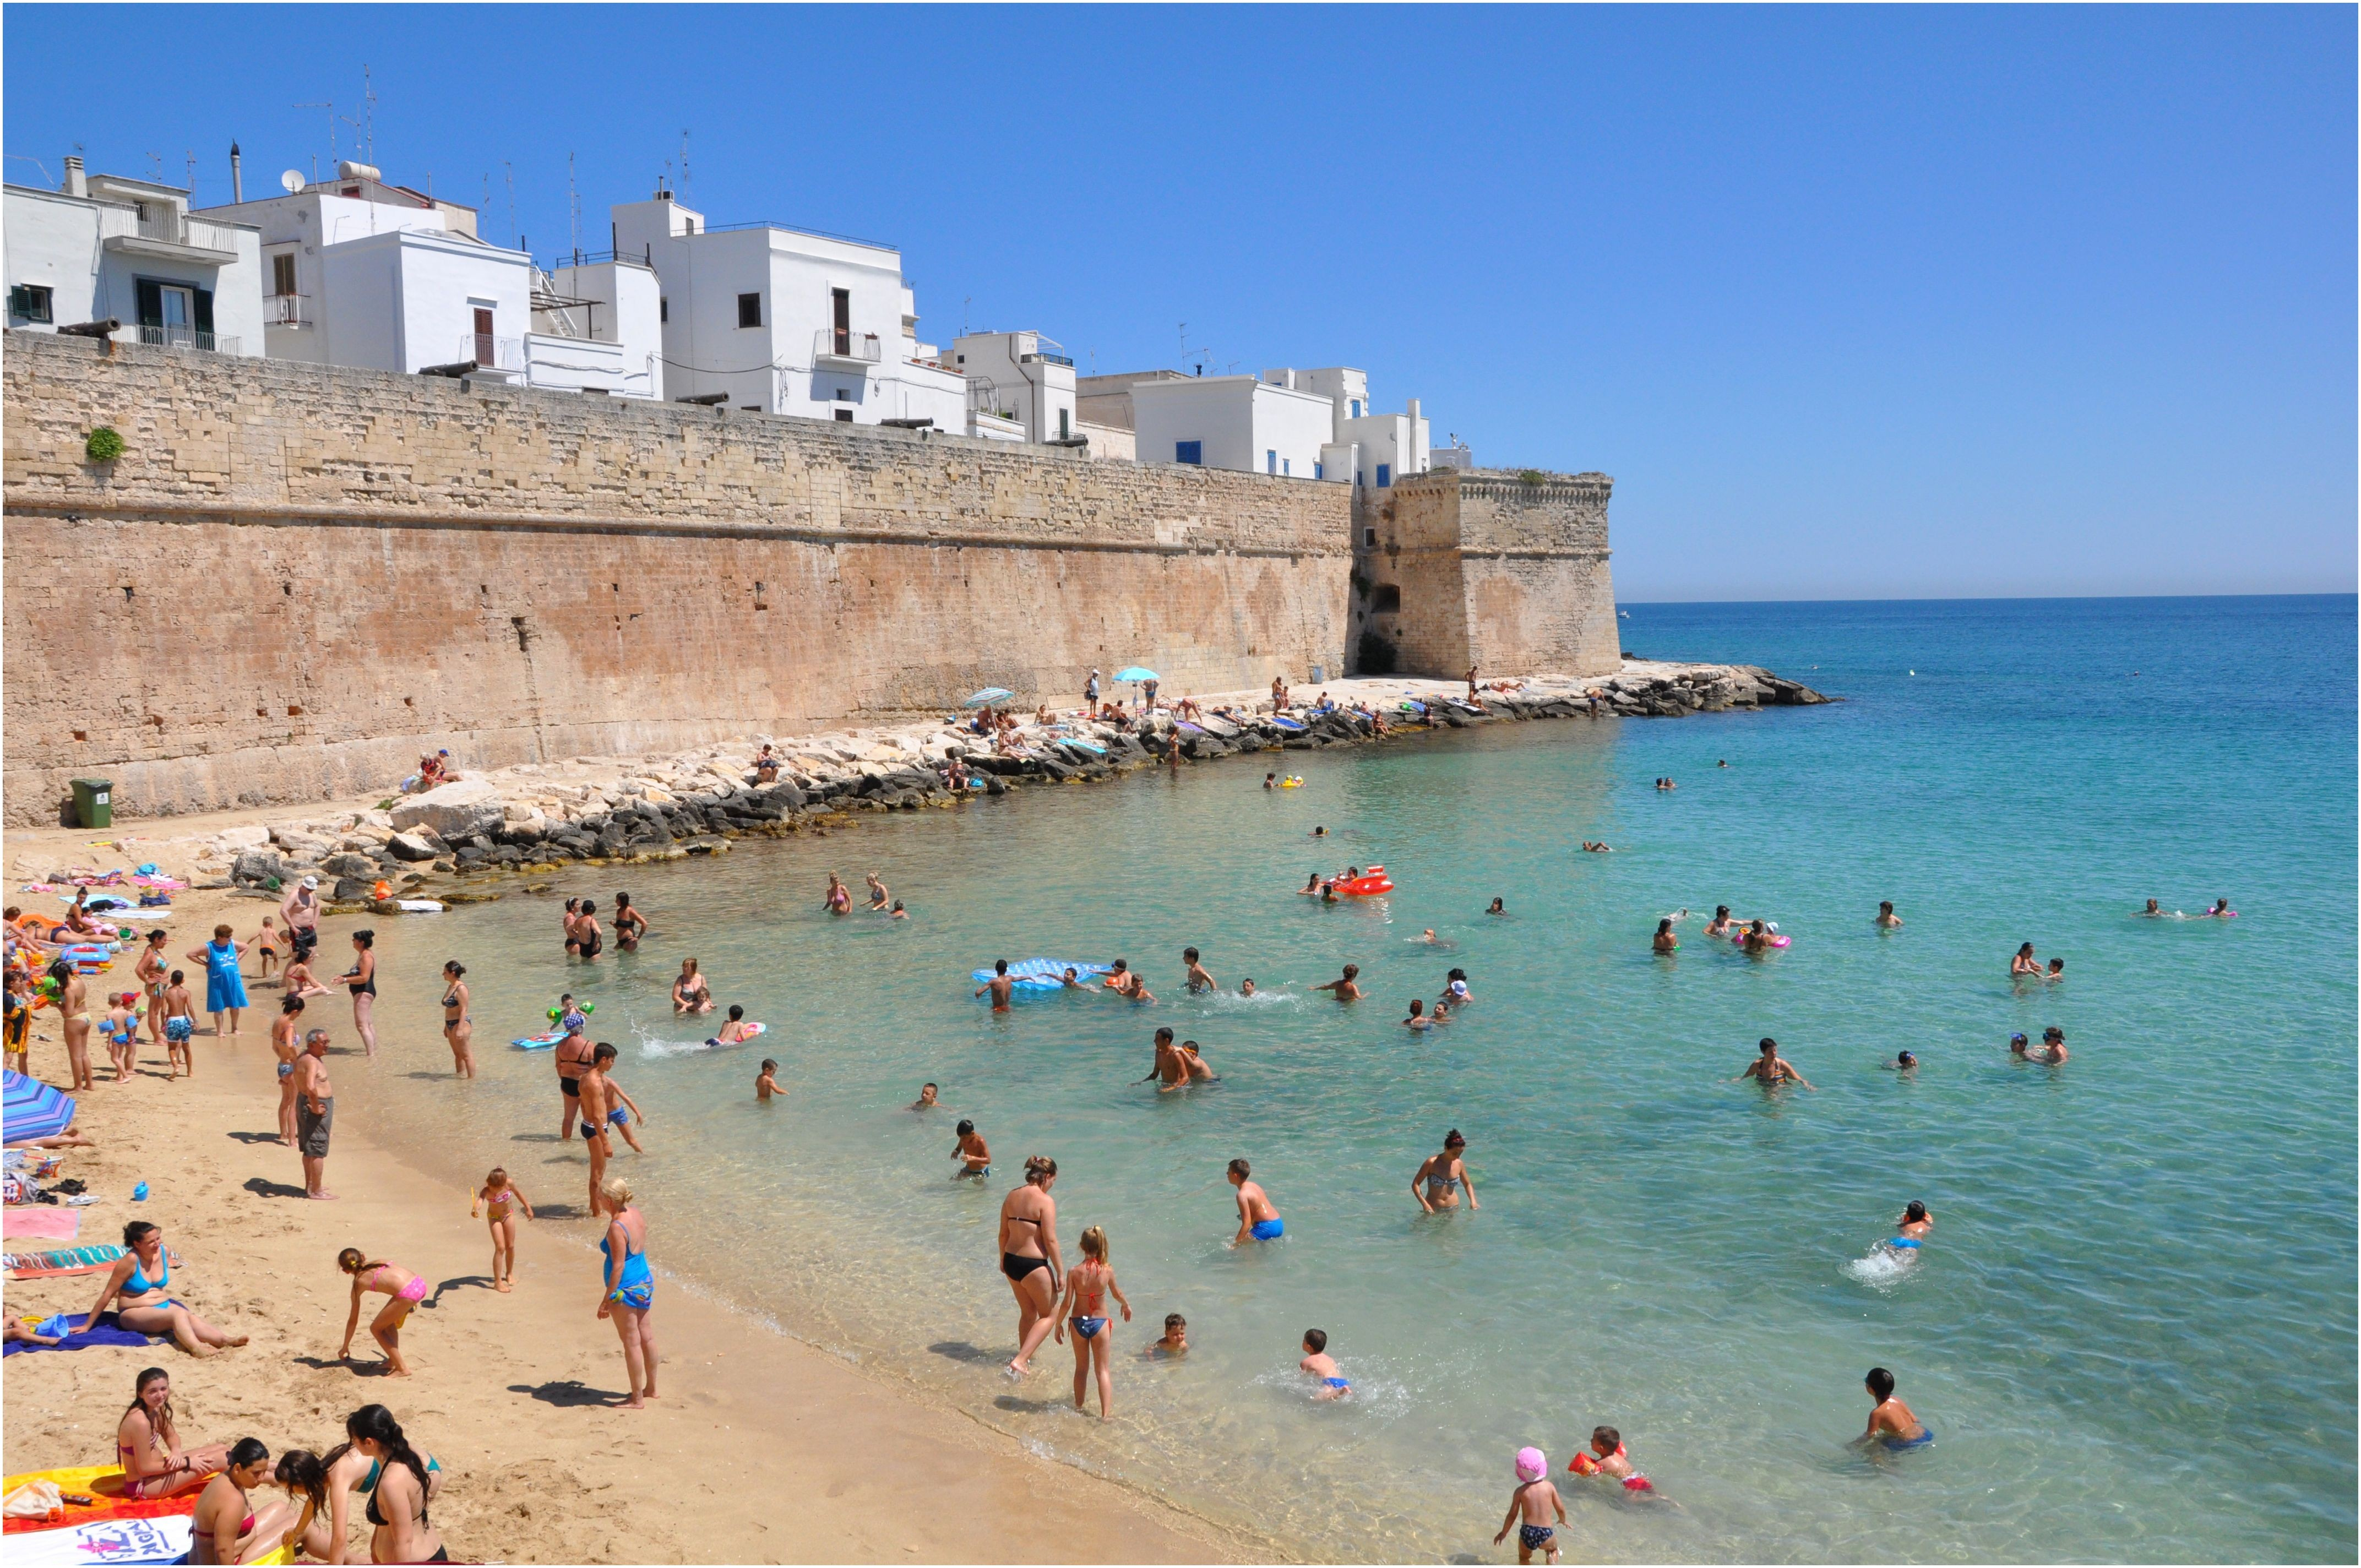 Town beach of Monopoli Puglia